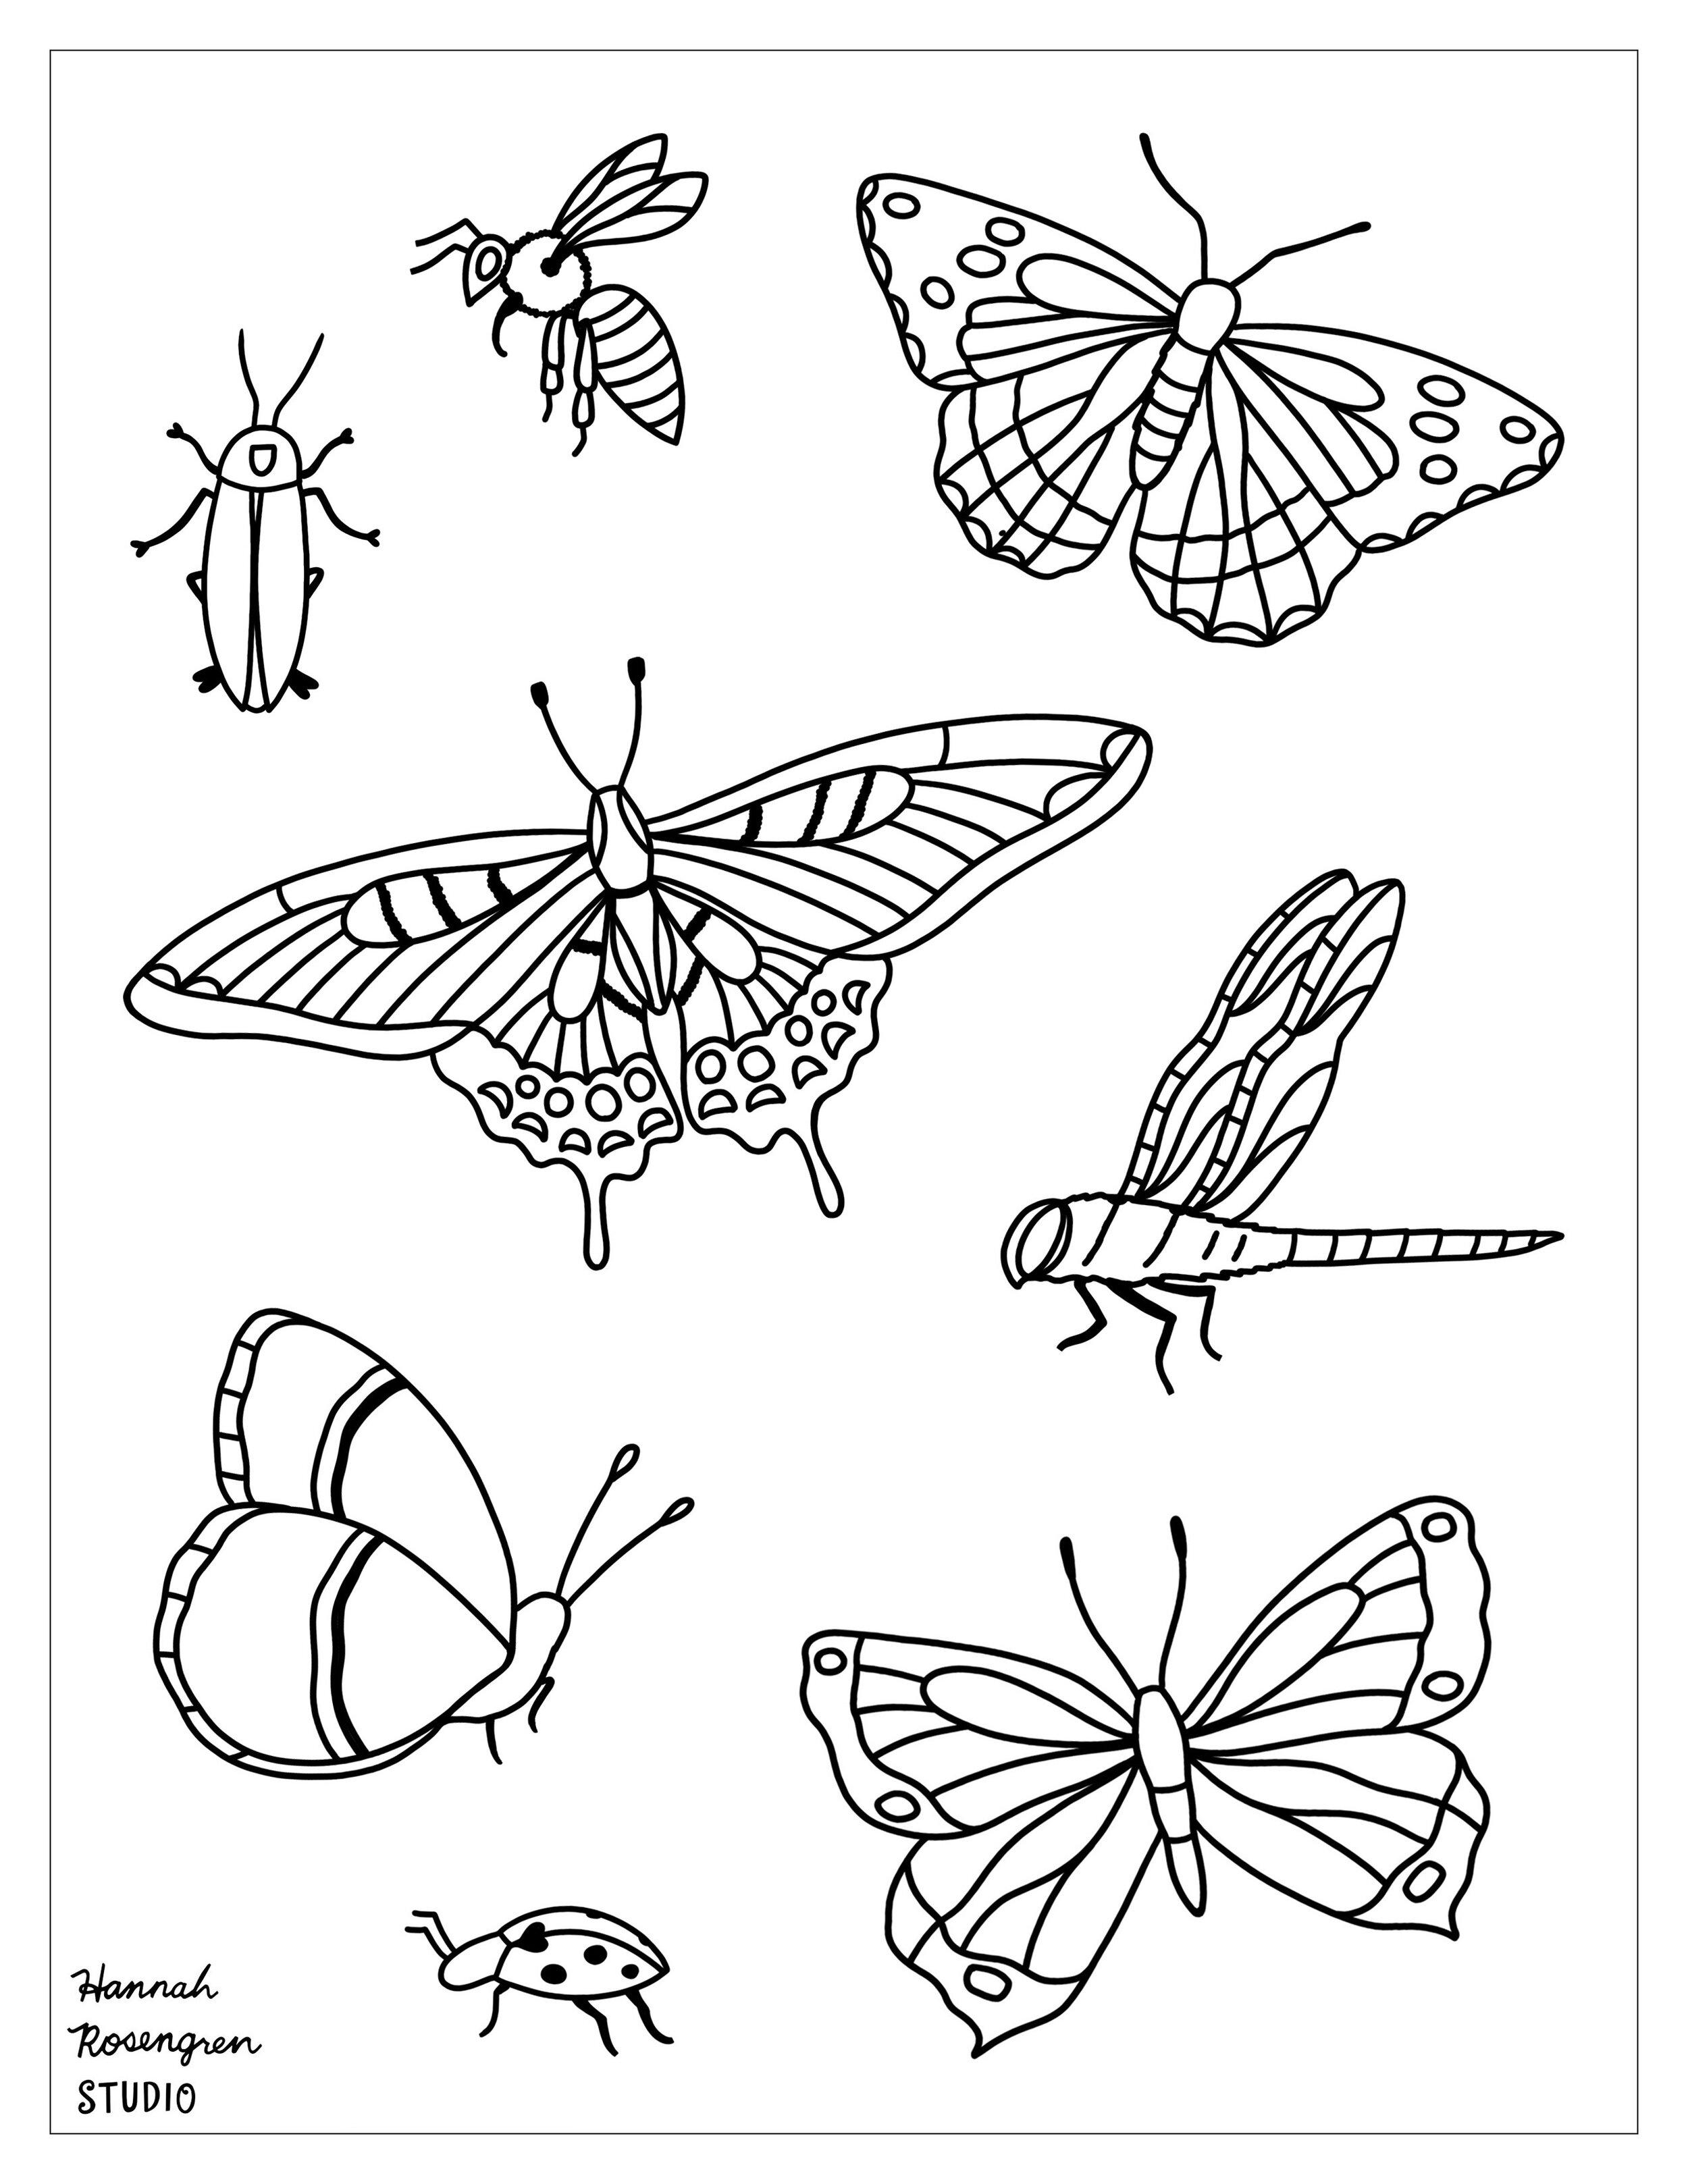 Printable Coloring Pages Hannah Rosengren Studio